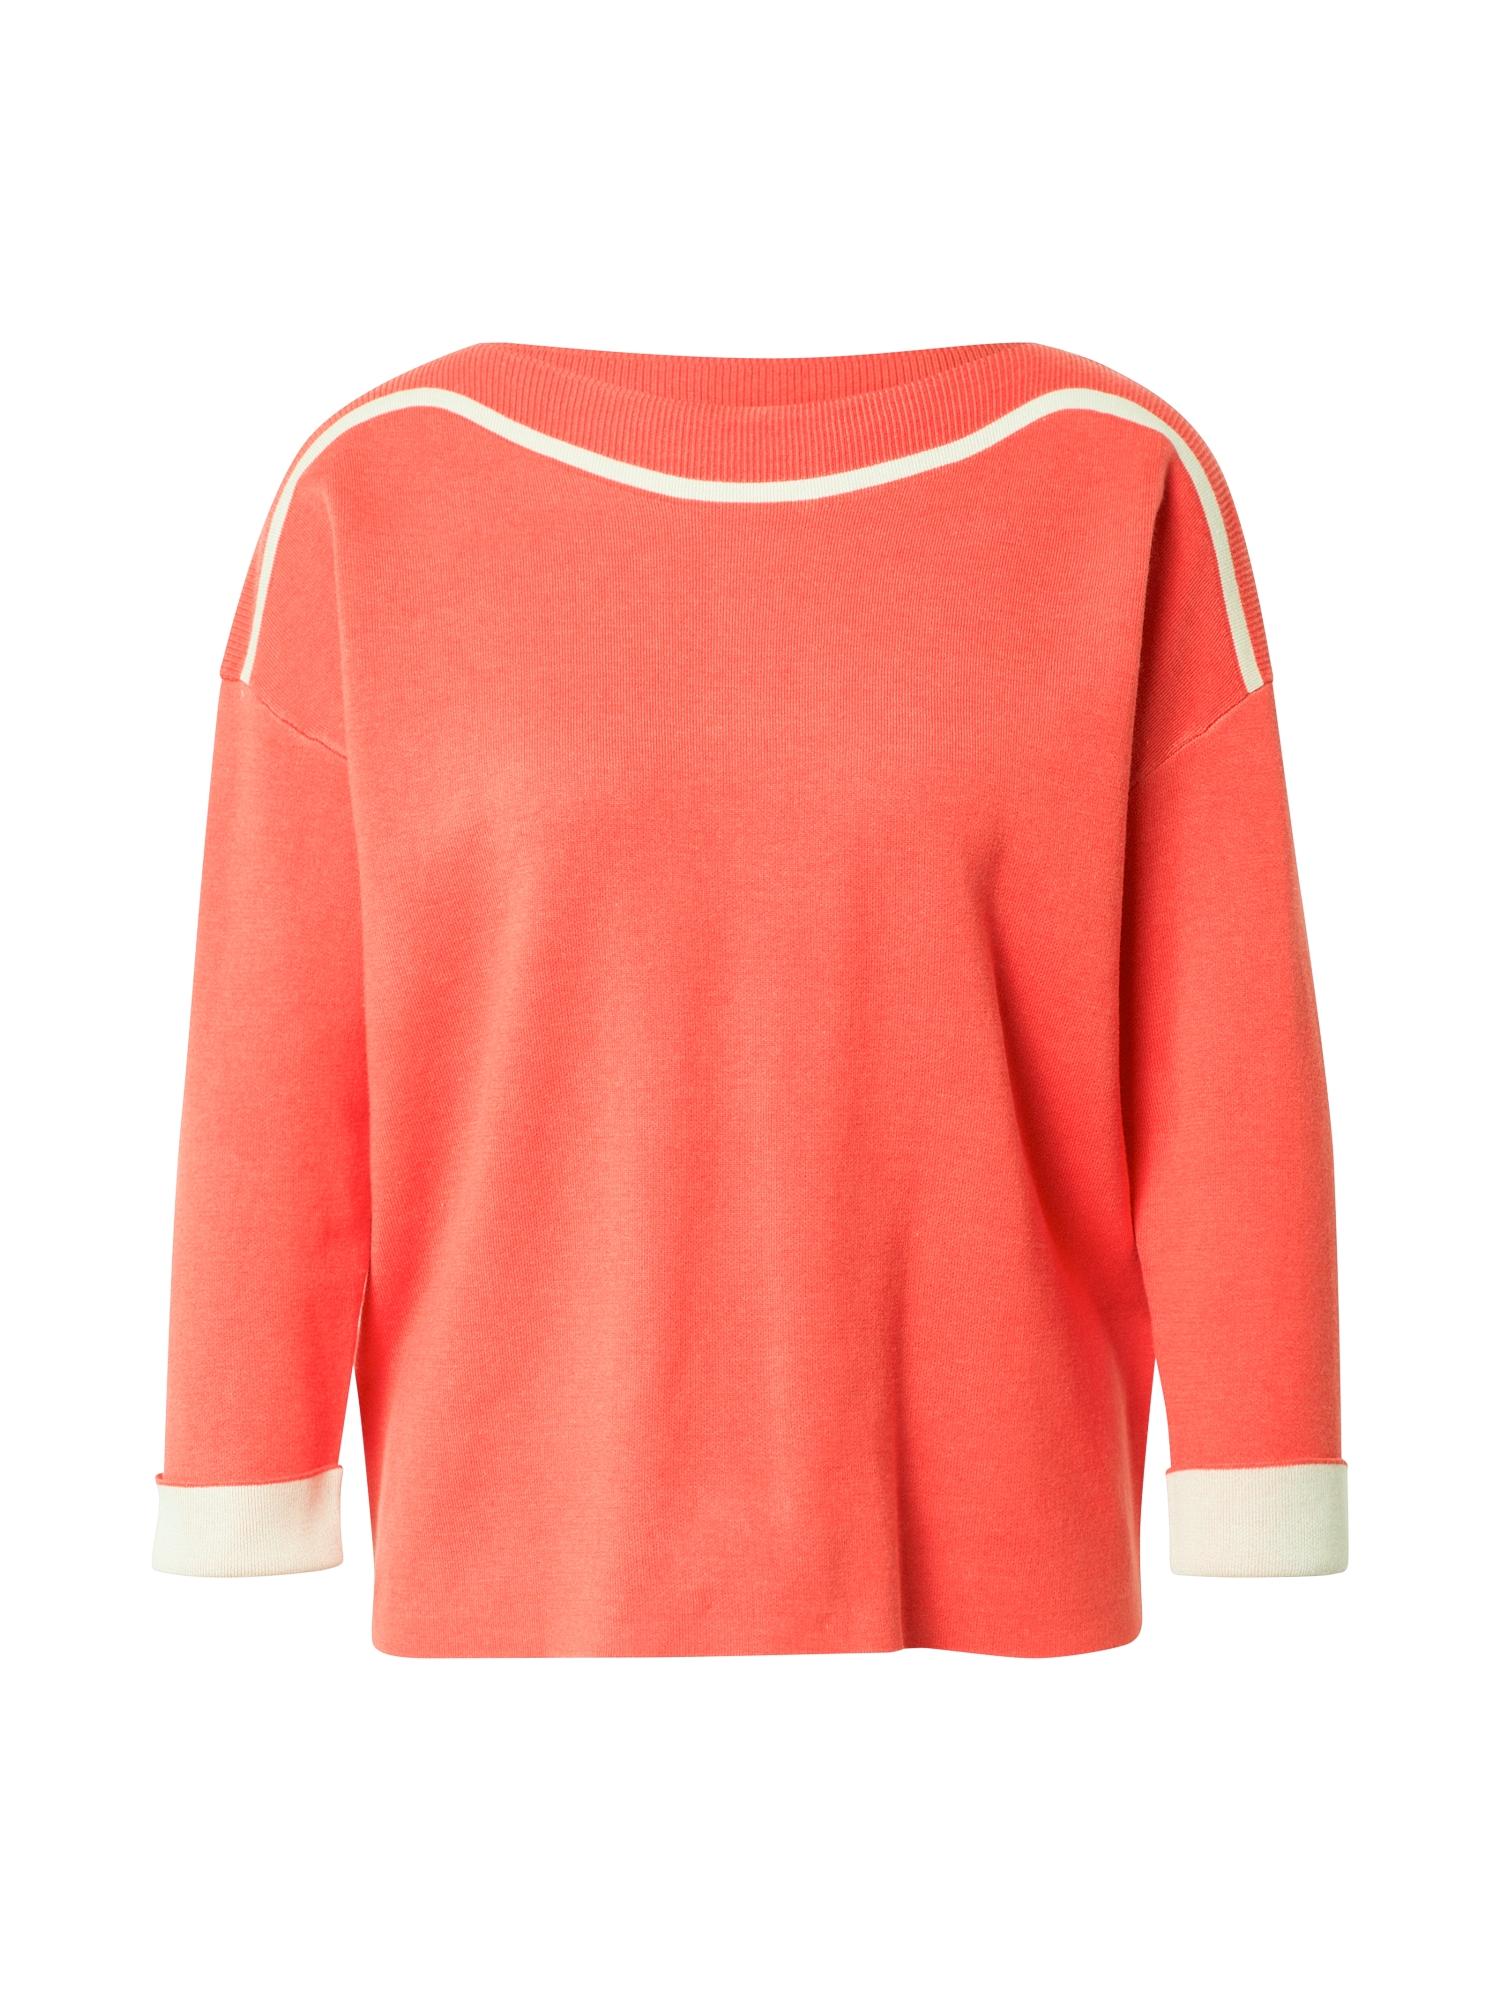 COMMA Megztinis raudona